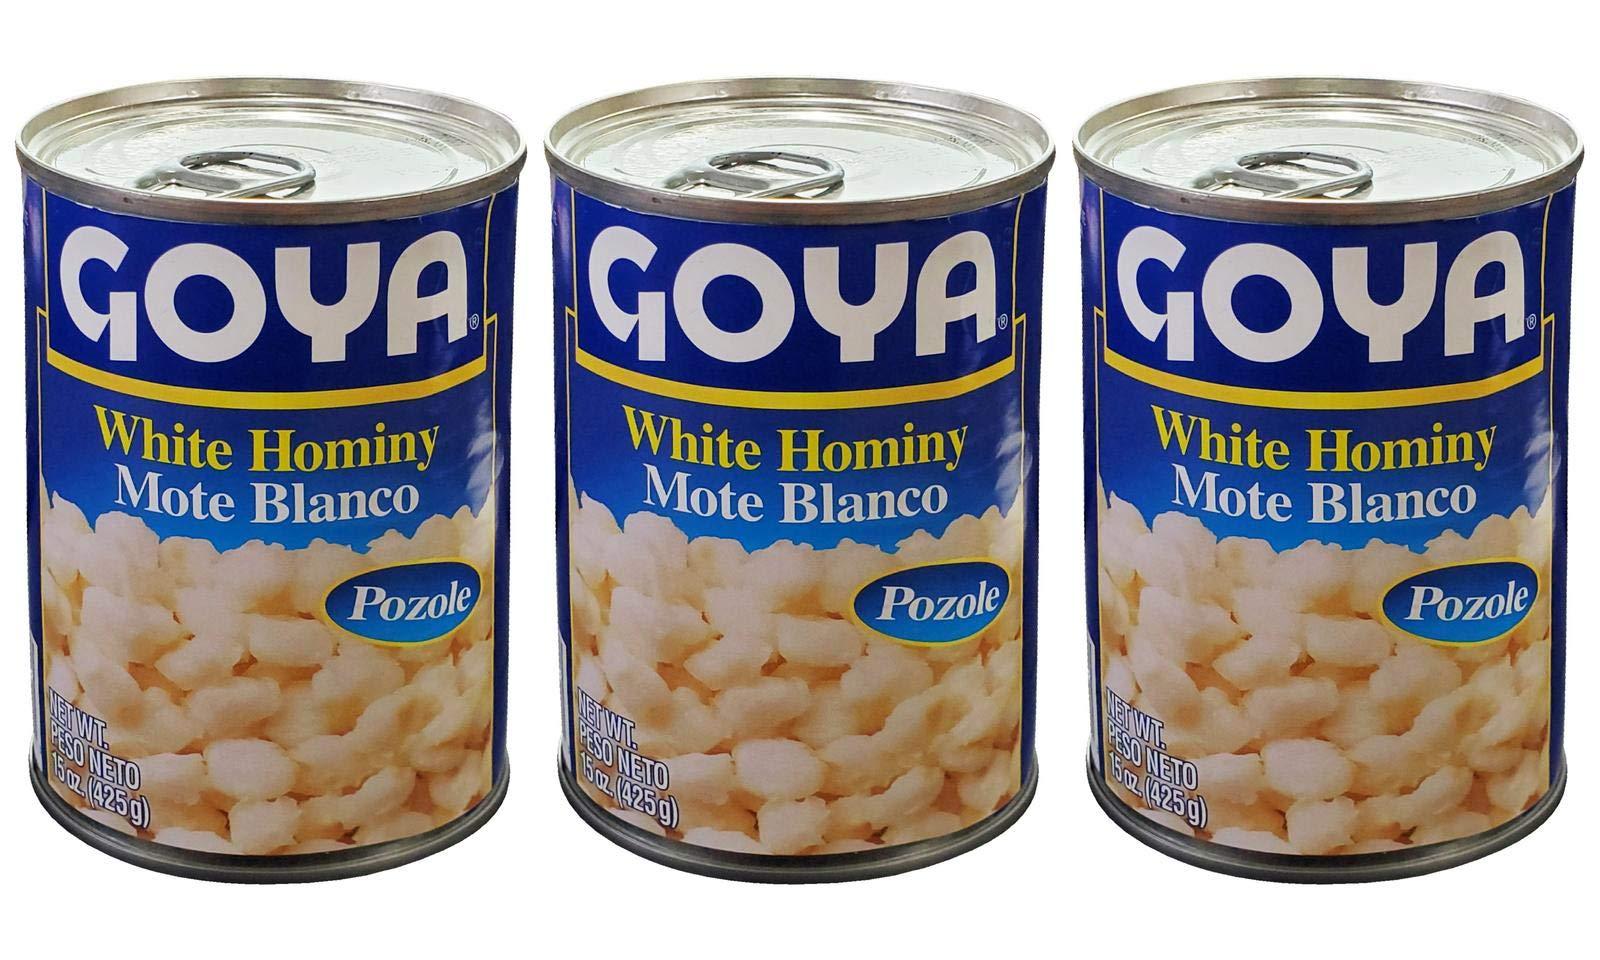 Goya White Hominy Corn, 15 oz, (3 cans) Mote Blanco - Pozole